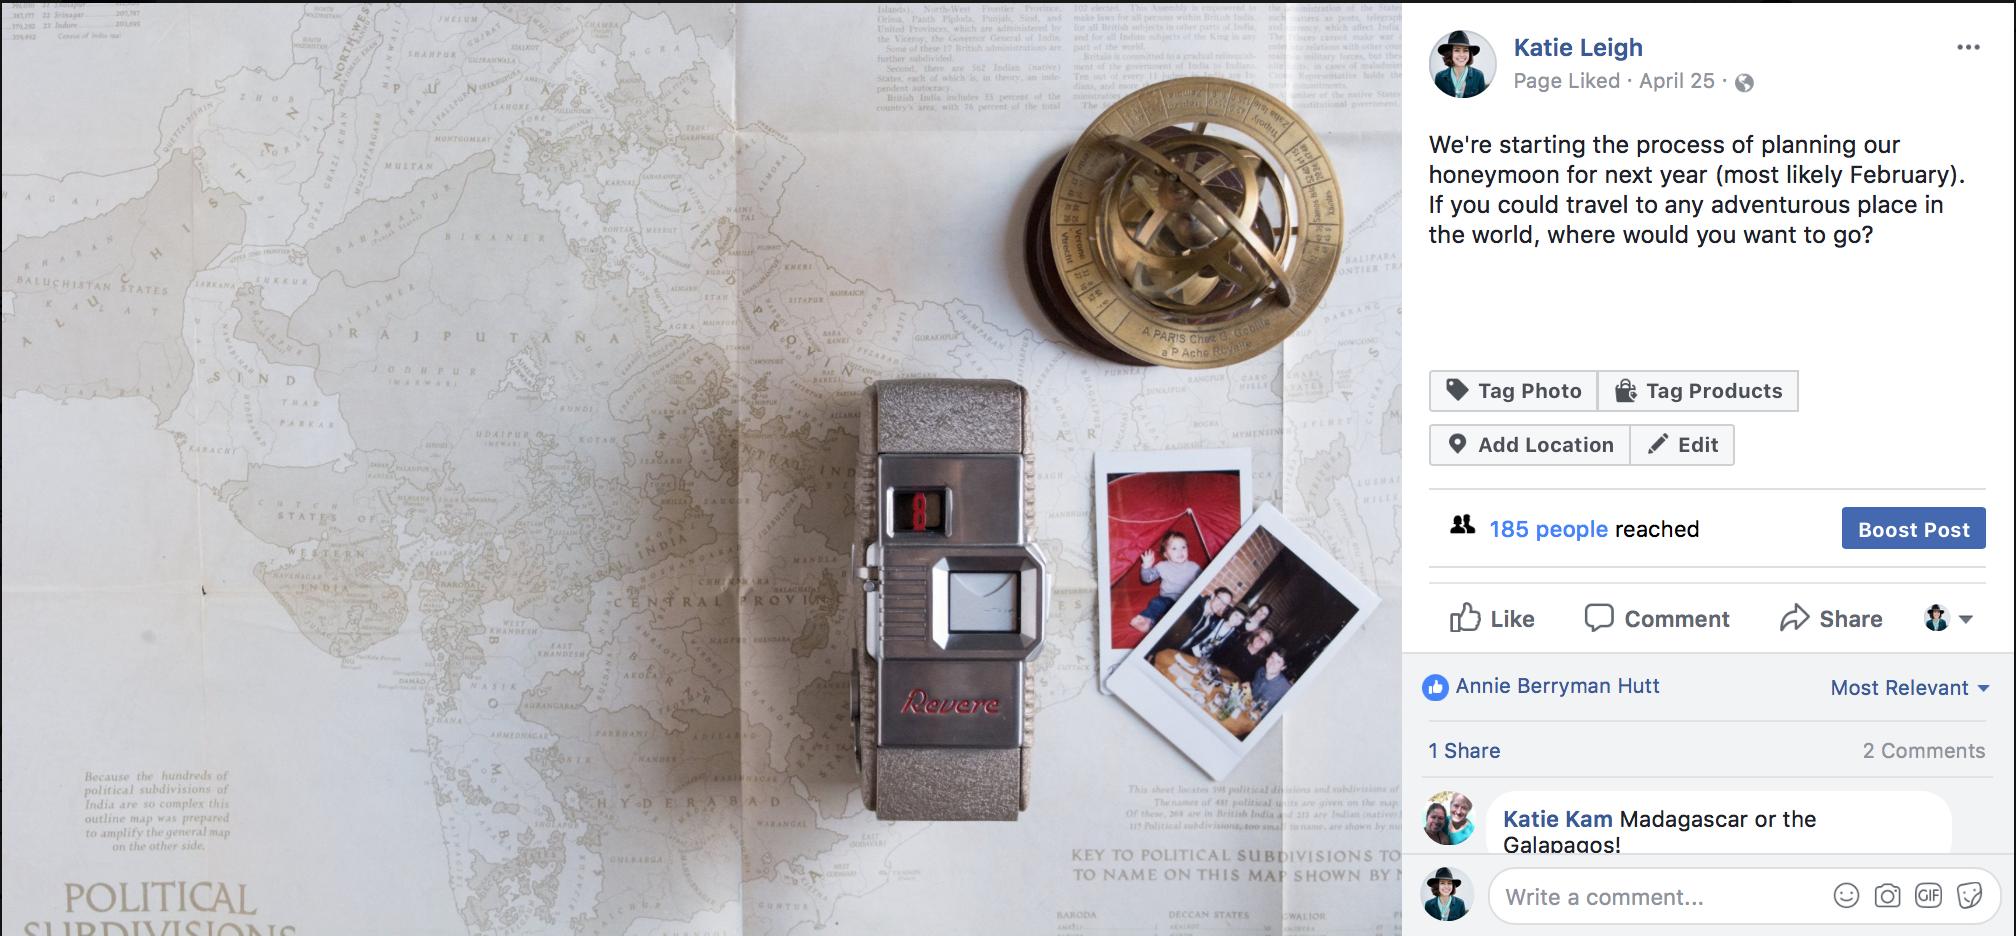 Posting the same image to multiple platforms